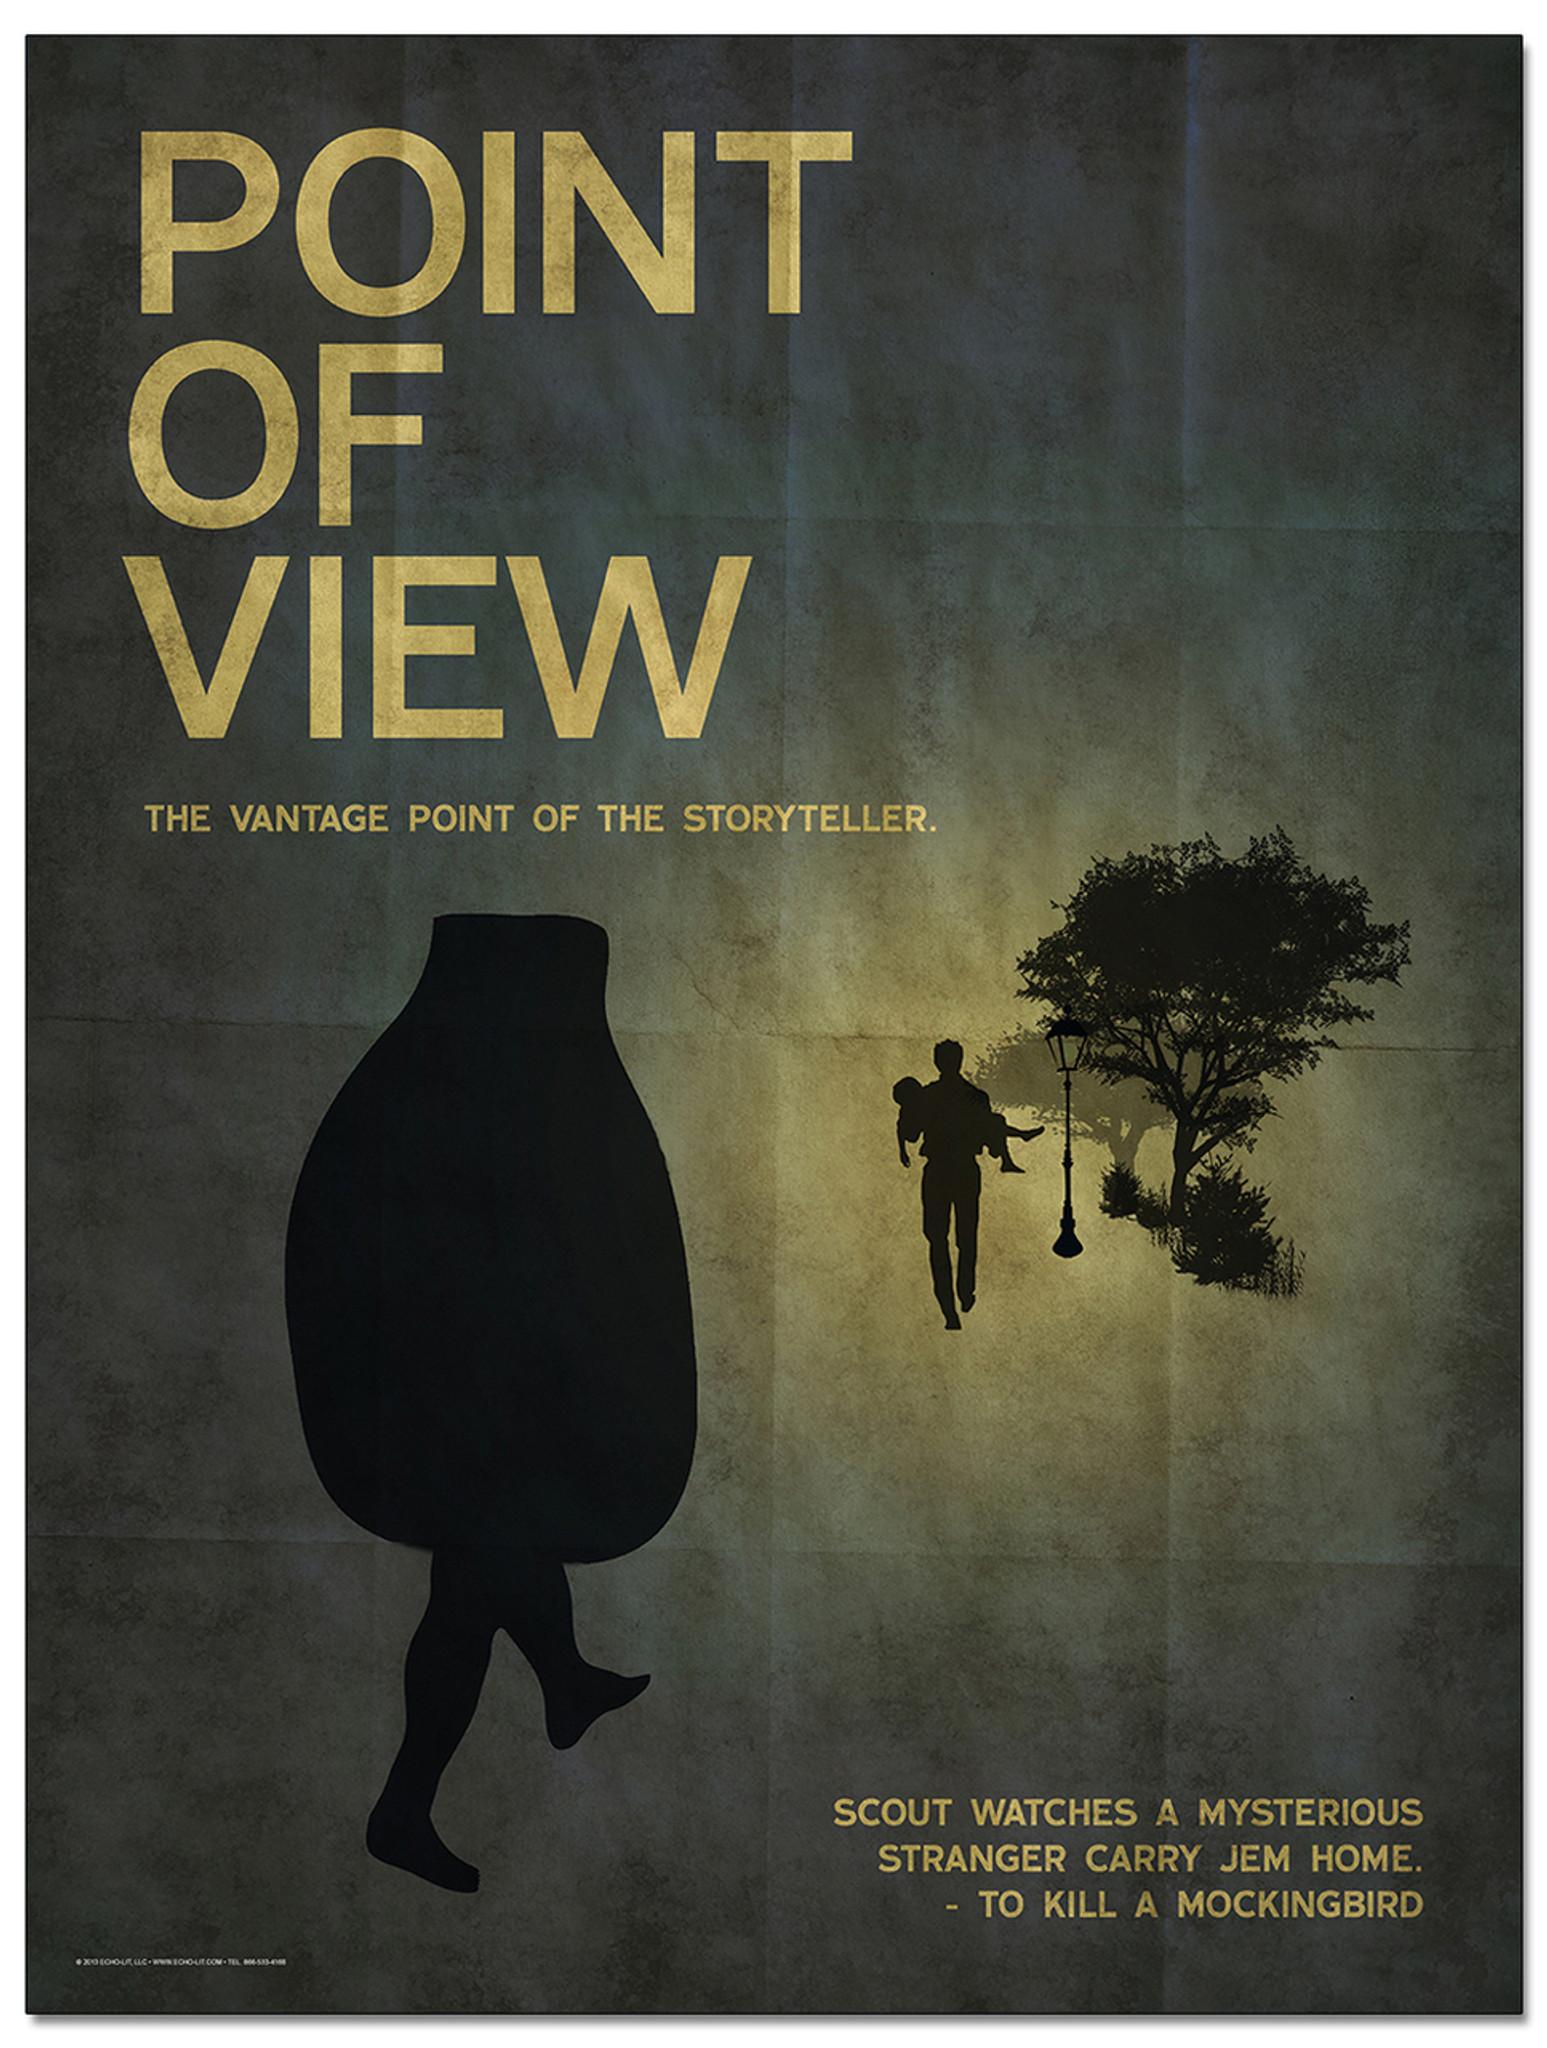 to kill a mockingbird point of view